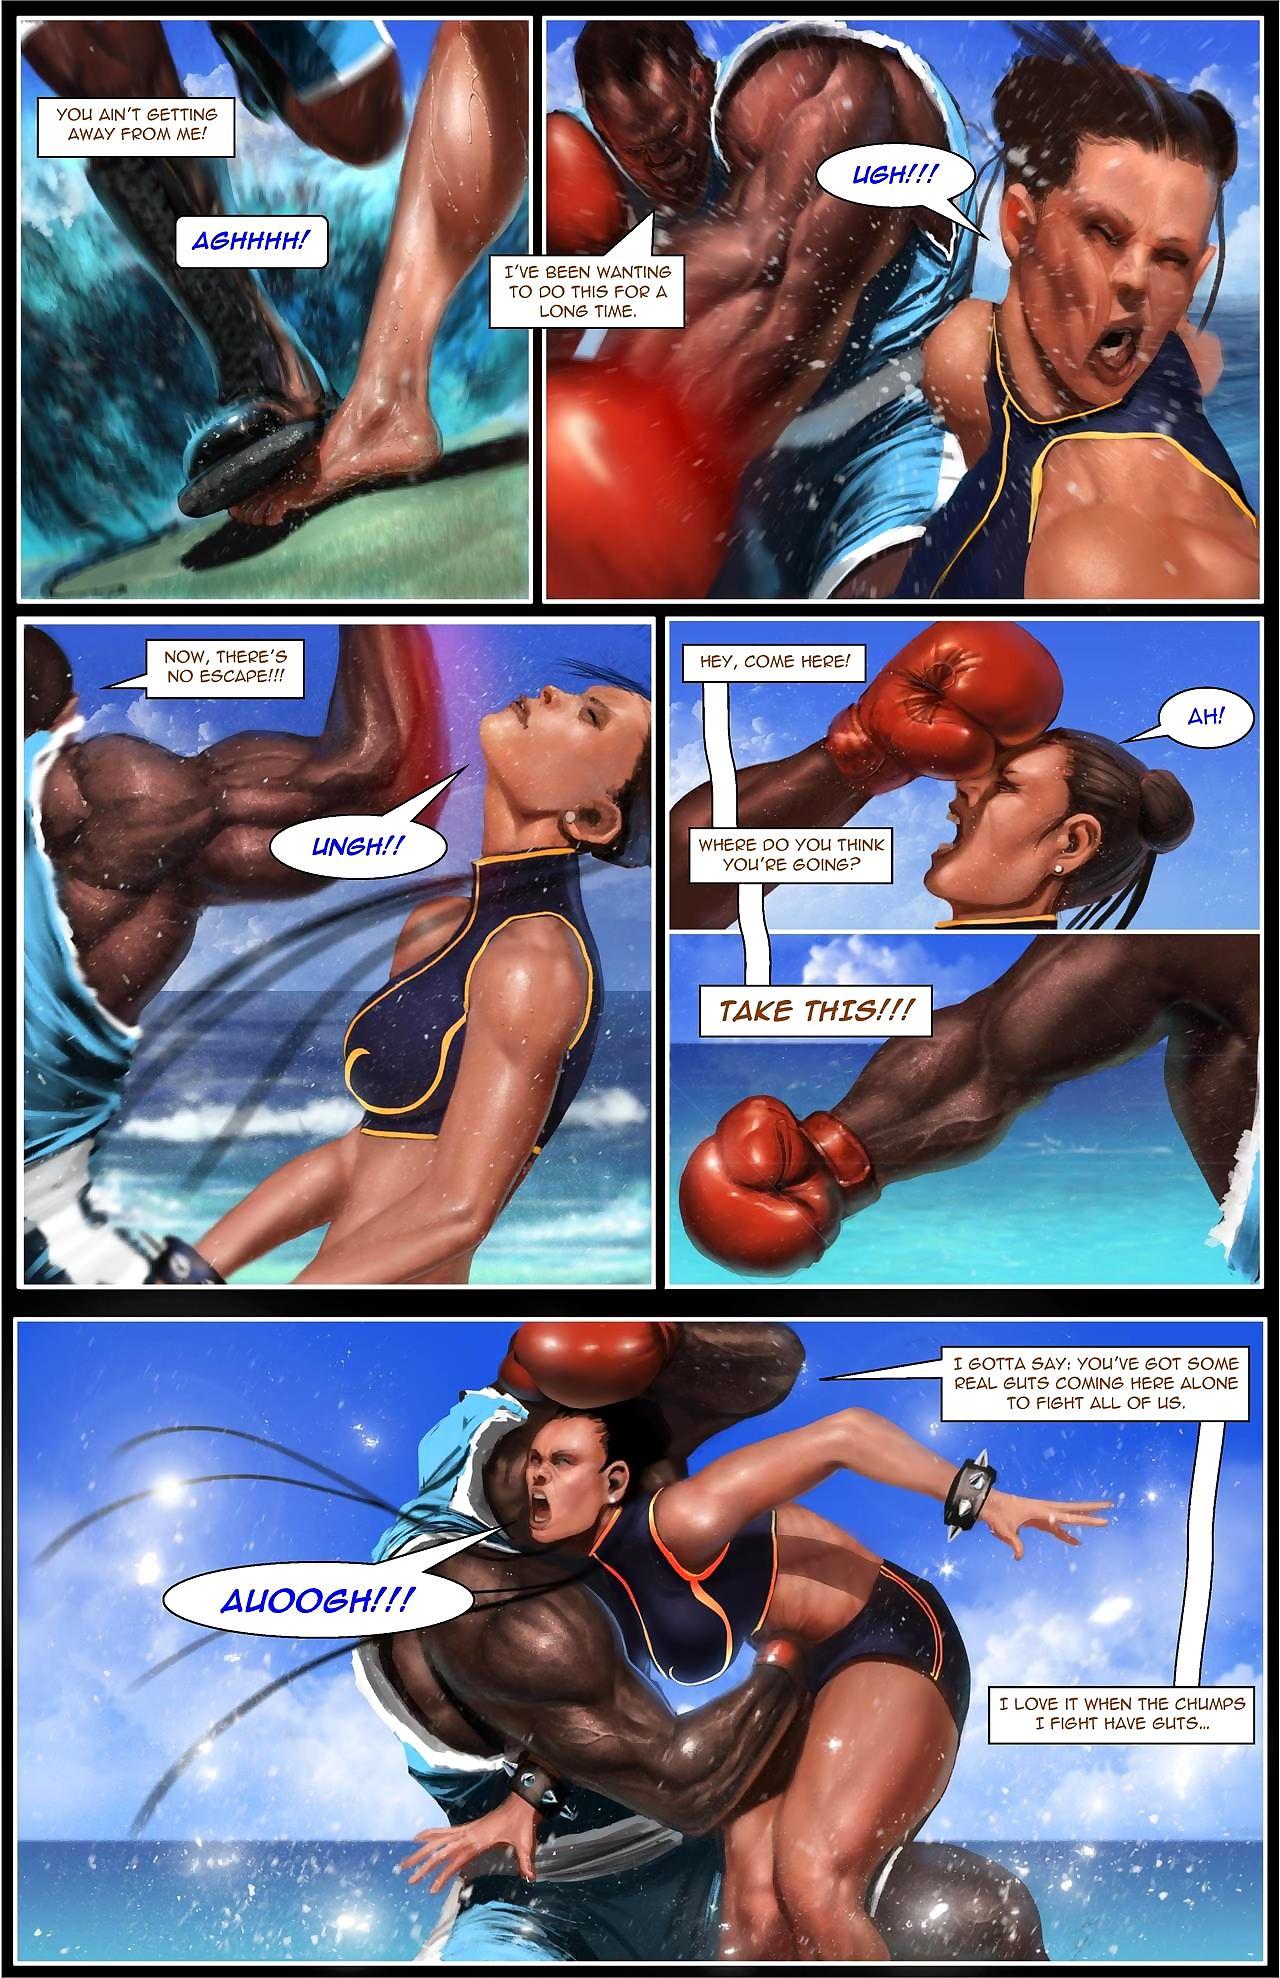 Chun-Li: A catch Gauntlet - fastening 2